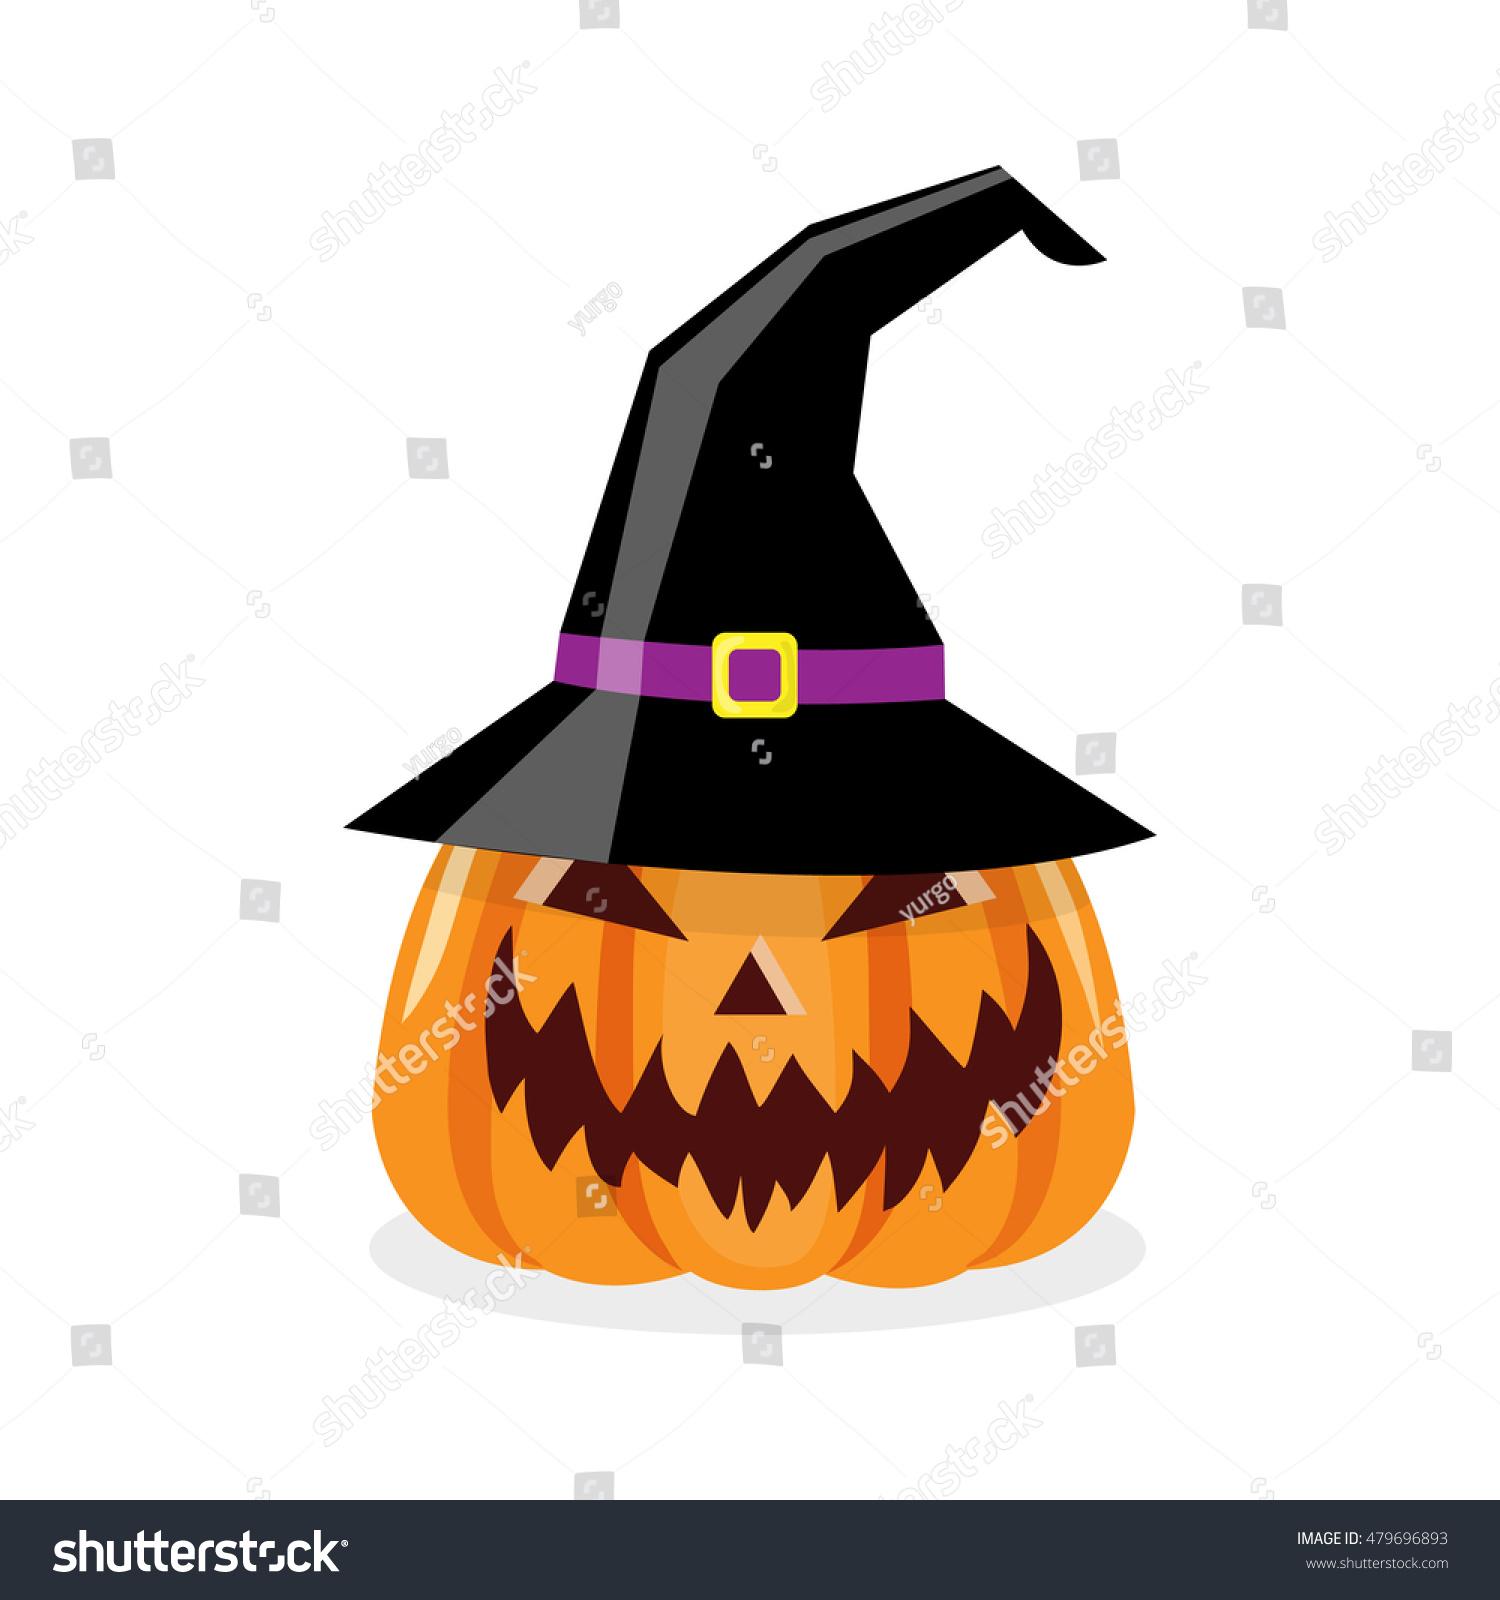 Halloween pumpkin head jack lantern made from plasticine. Cartoon Illustration Scary Halloween Pumpkin Witch Stock Vector Royalty Free 479696893